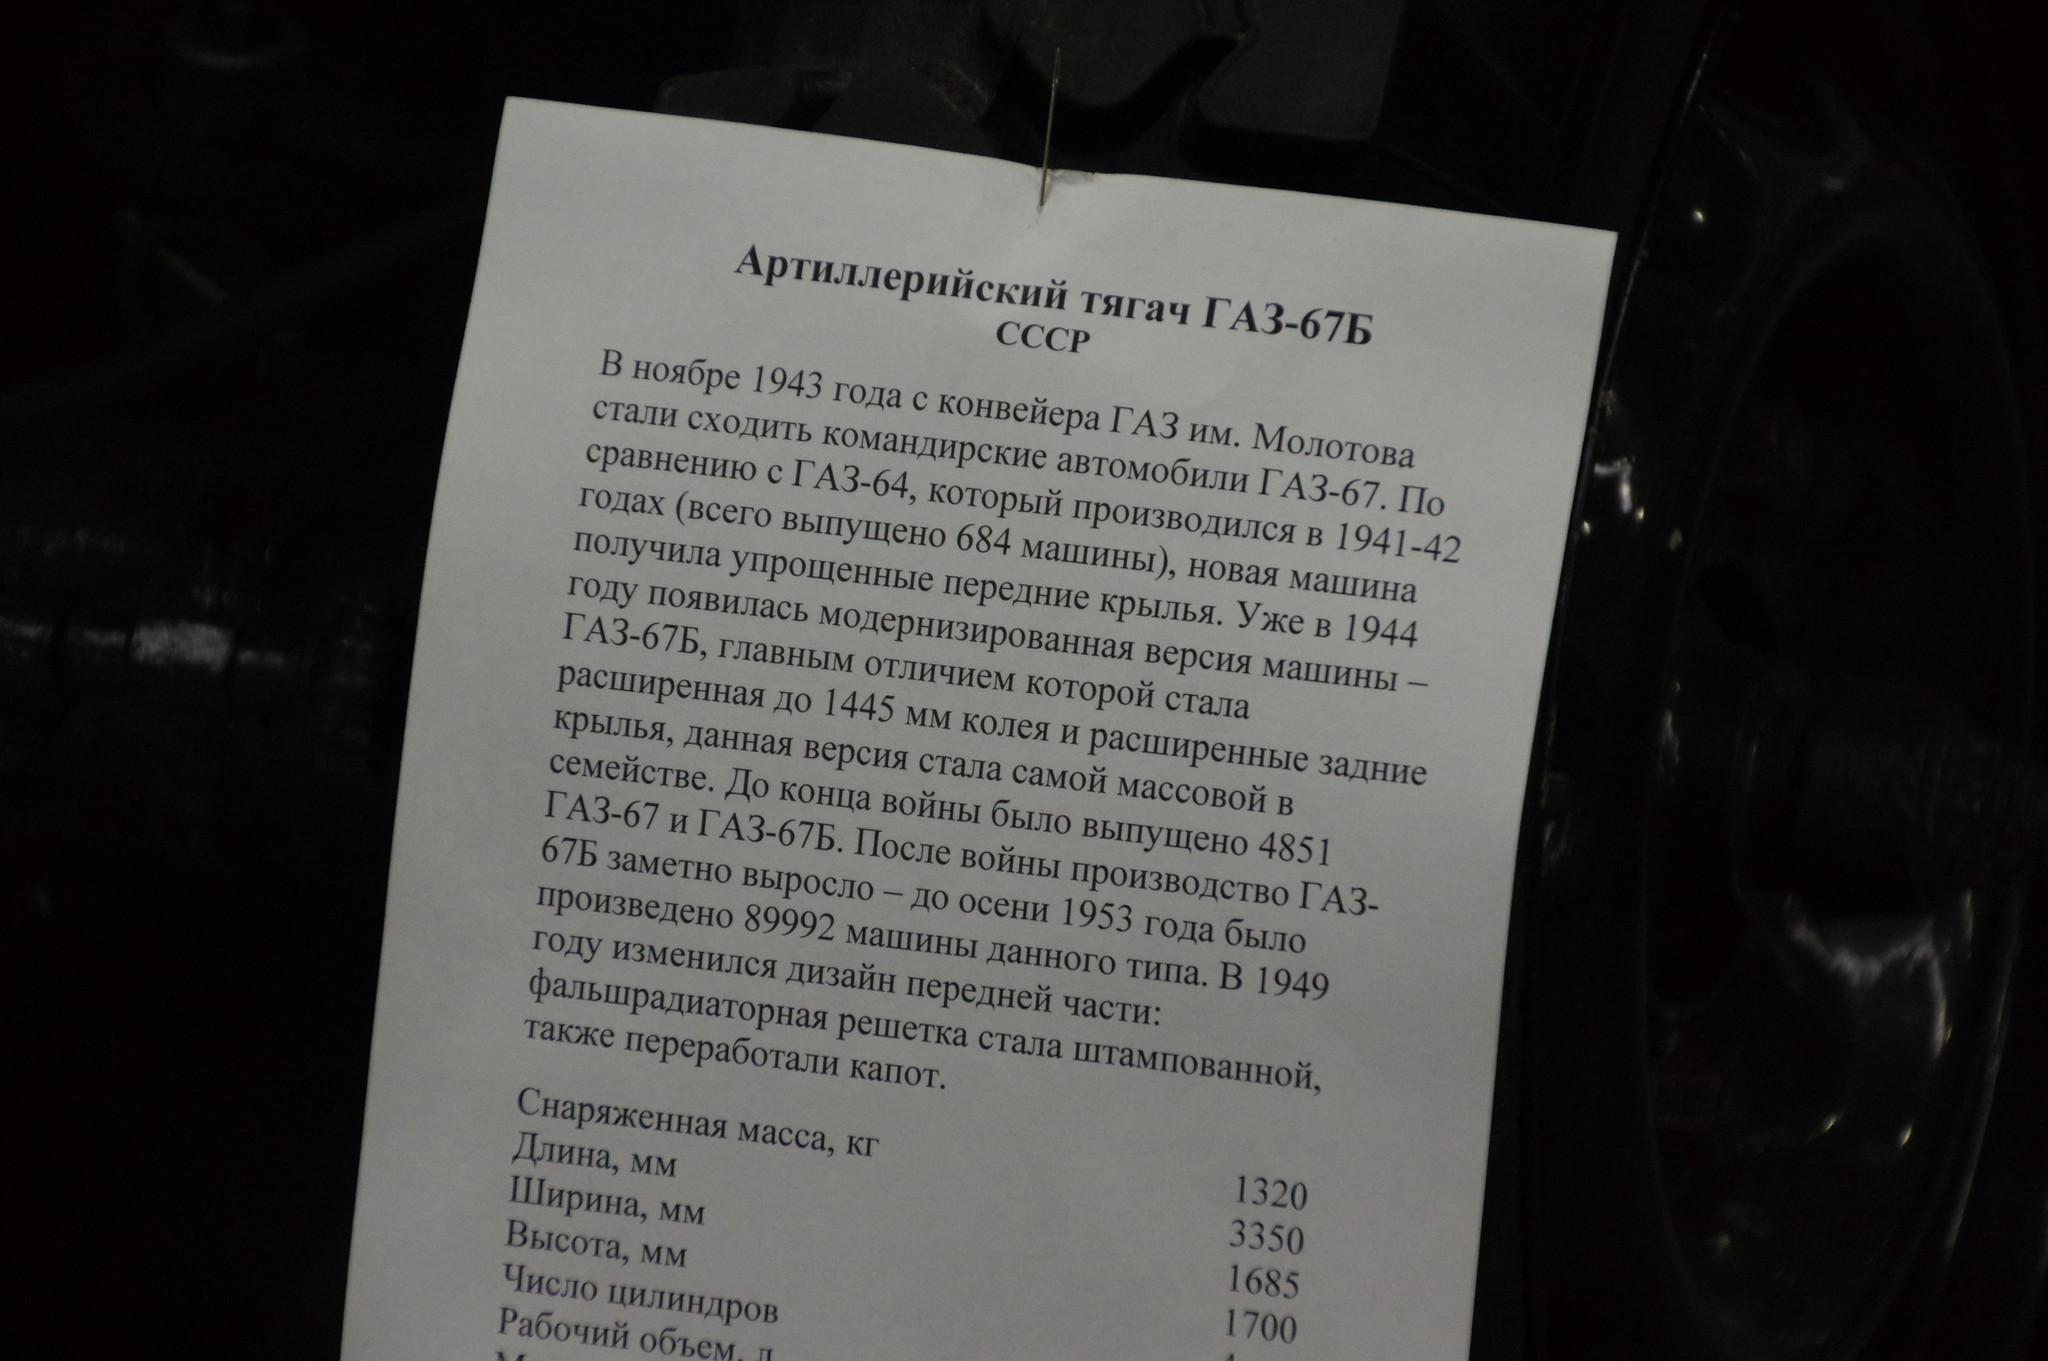 Артиллерийский тягач ГАЗ-67Б